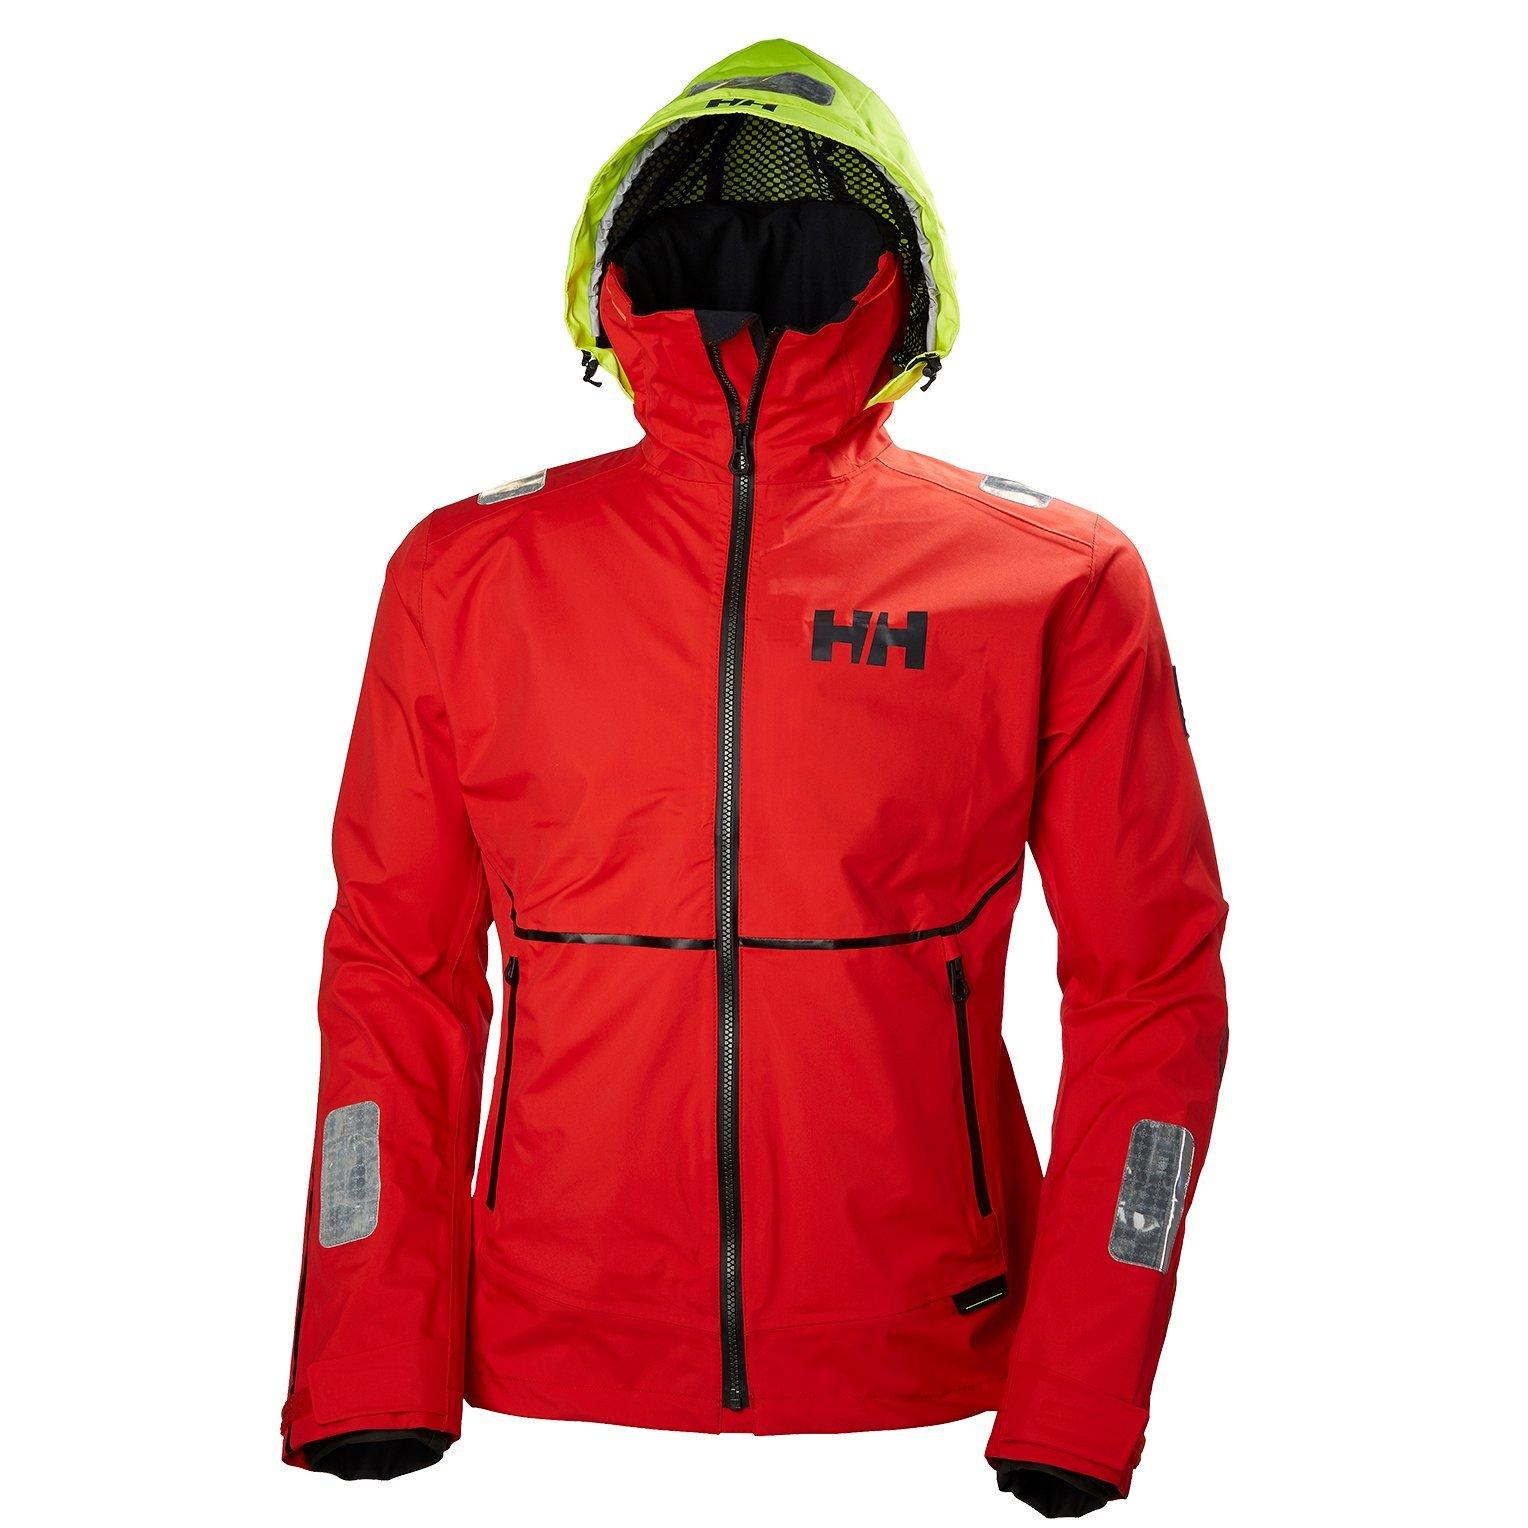 Helly Hansen 33876 Men's HP Foil Jacket, Alert Red - XL